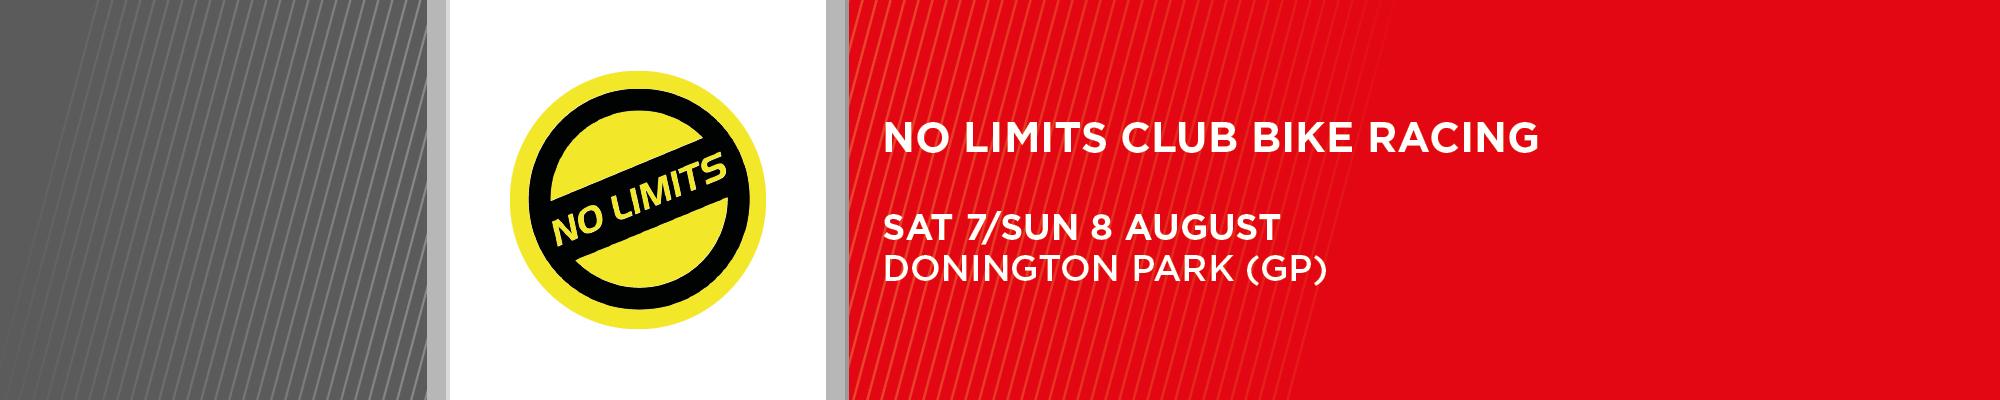 No Limits Racing Bike Championships